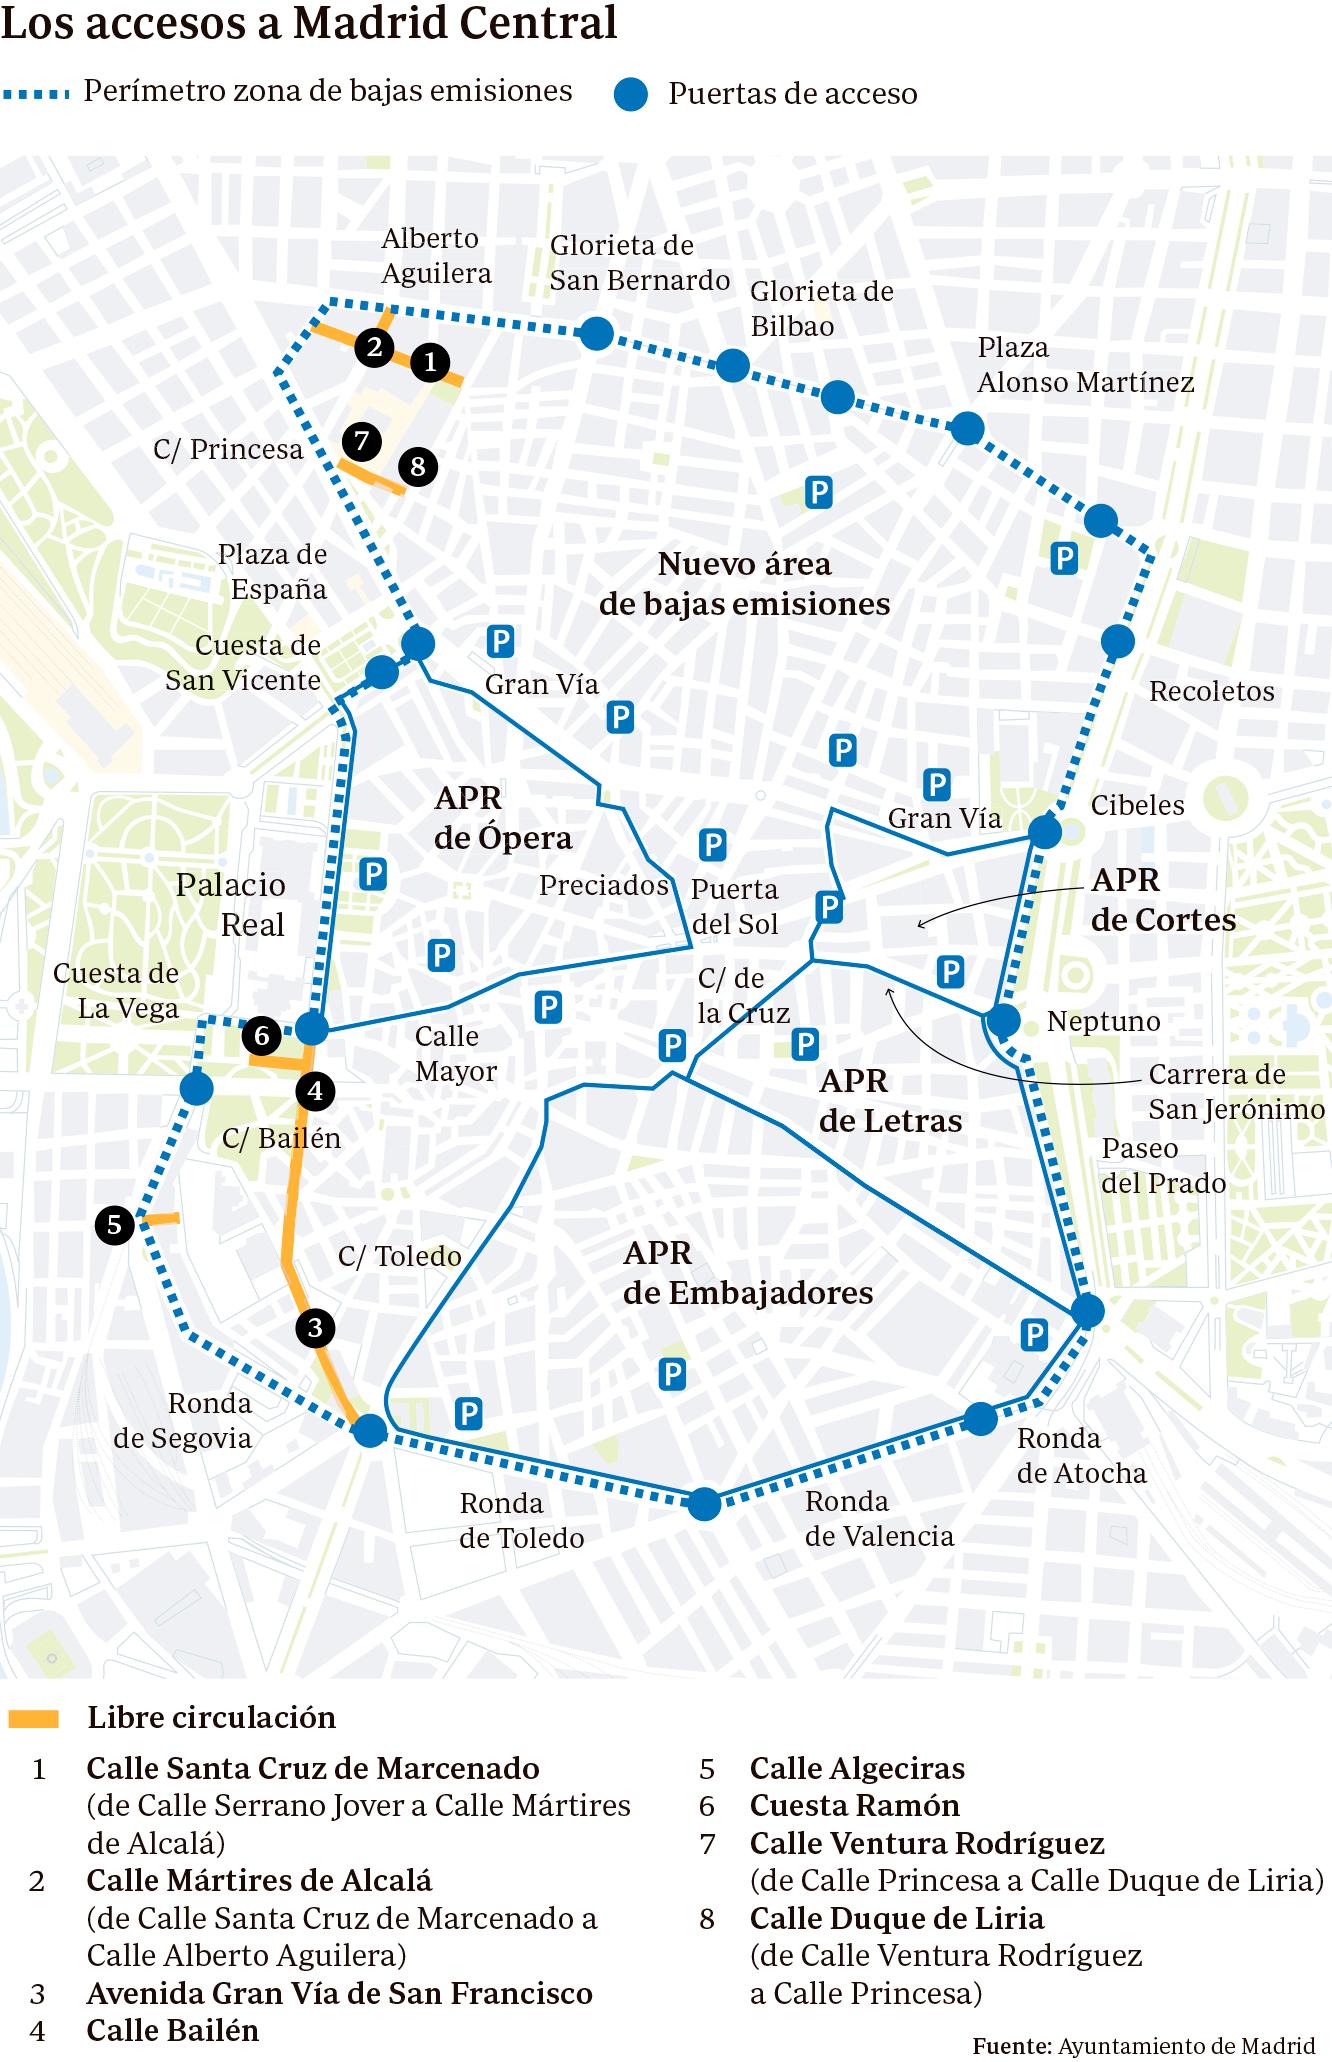 Mapa perimetral de Madrid Central